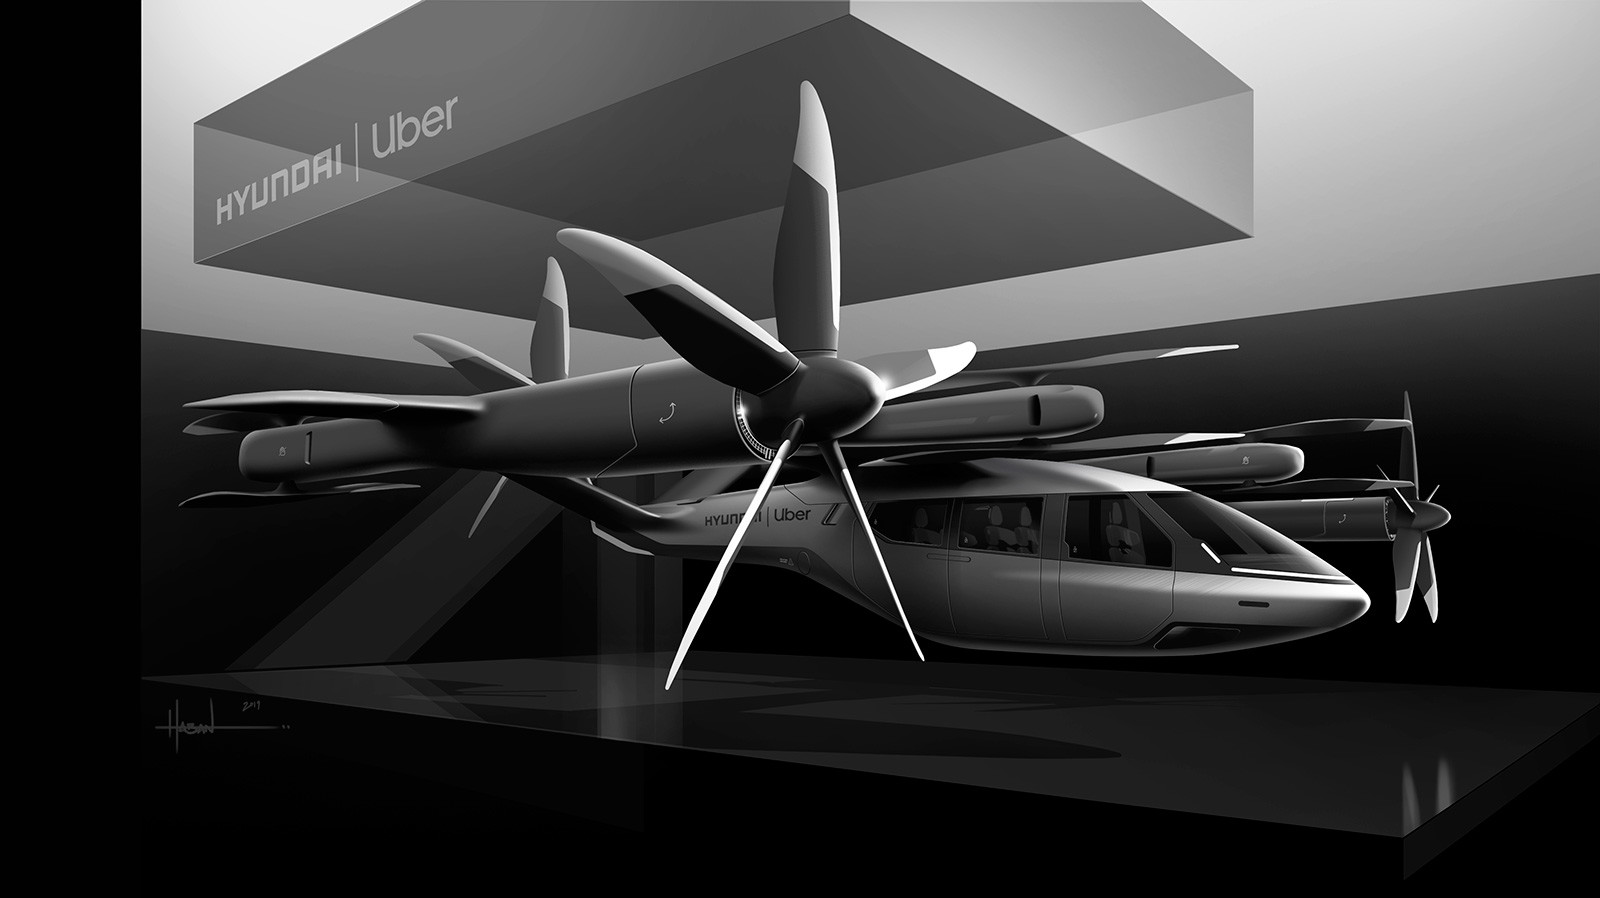 PAV S-A1, el taxi volador de Hyundai para Uber Elevate